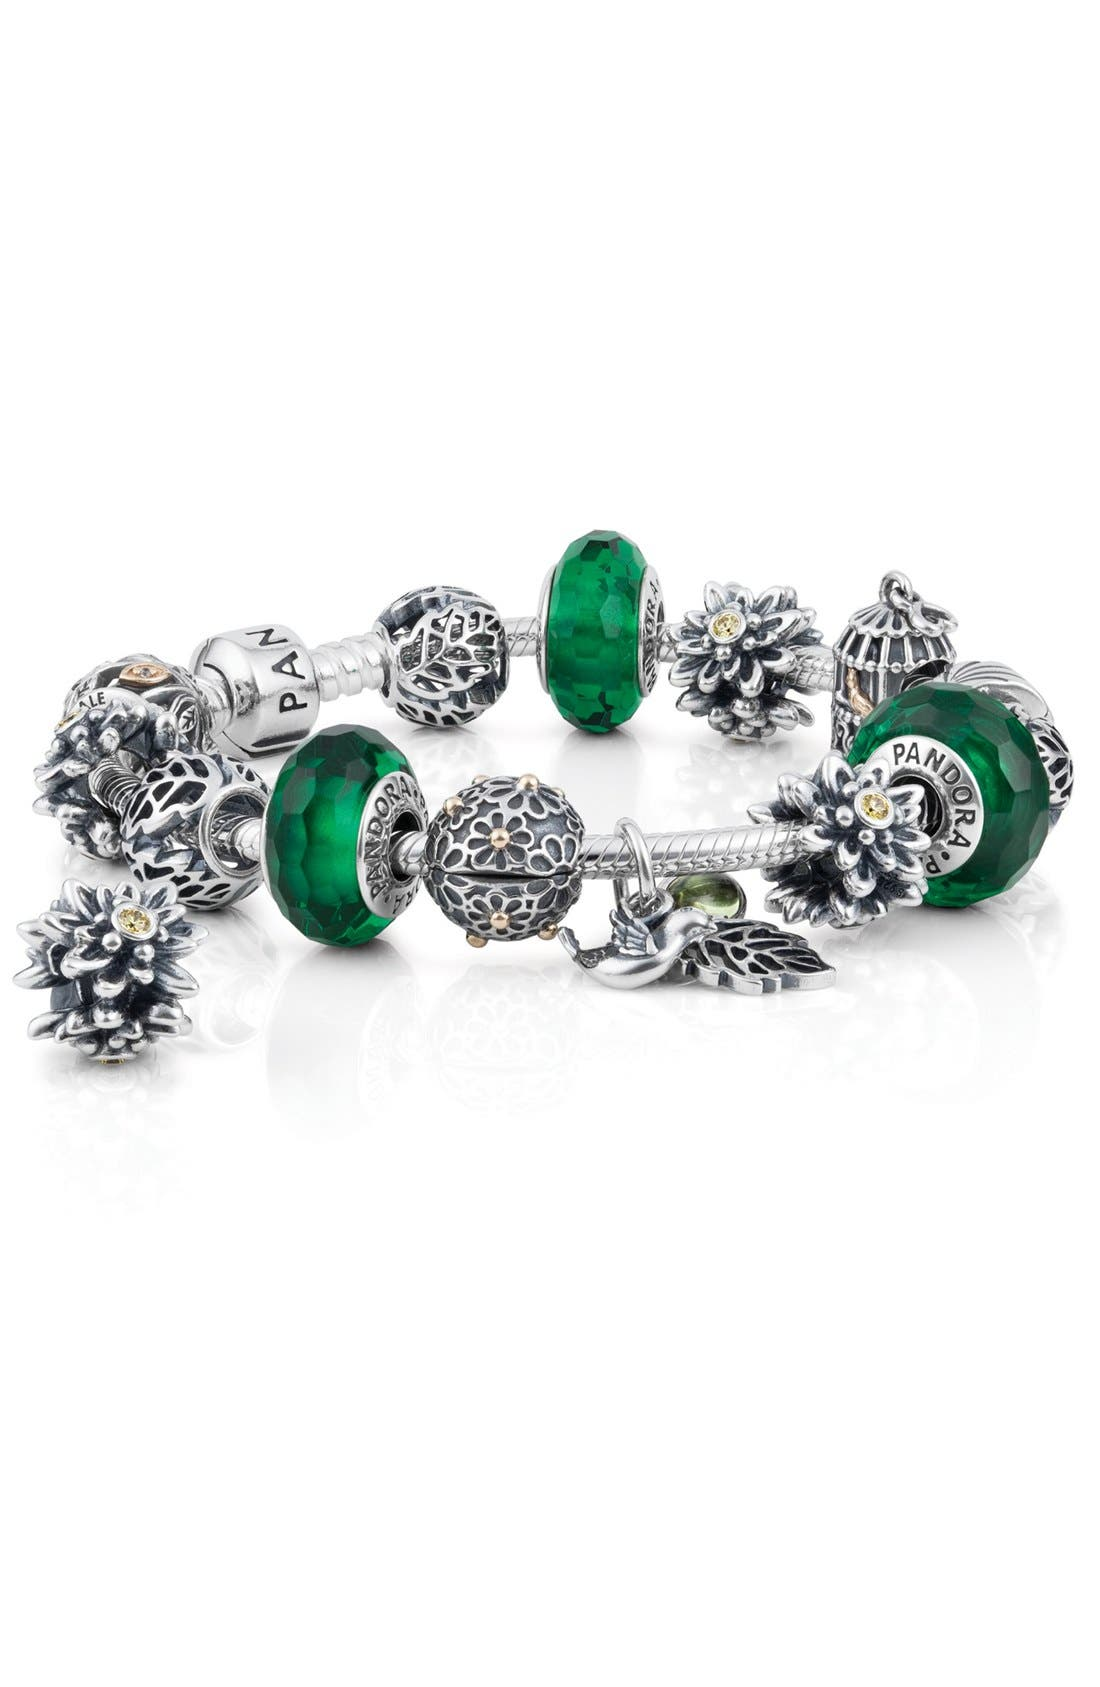 Main Image - PANDORA Charm Bracelet & Charms